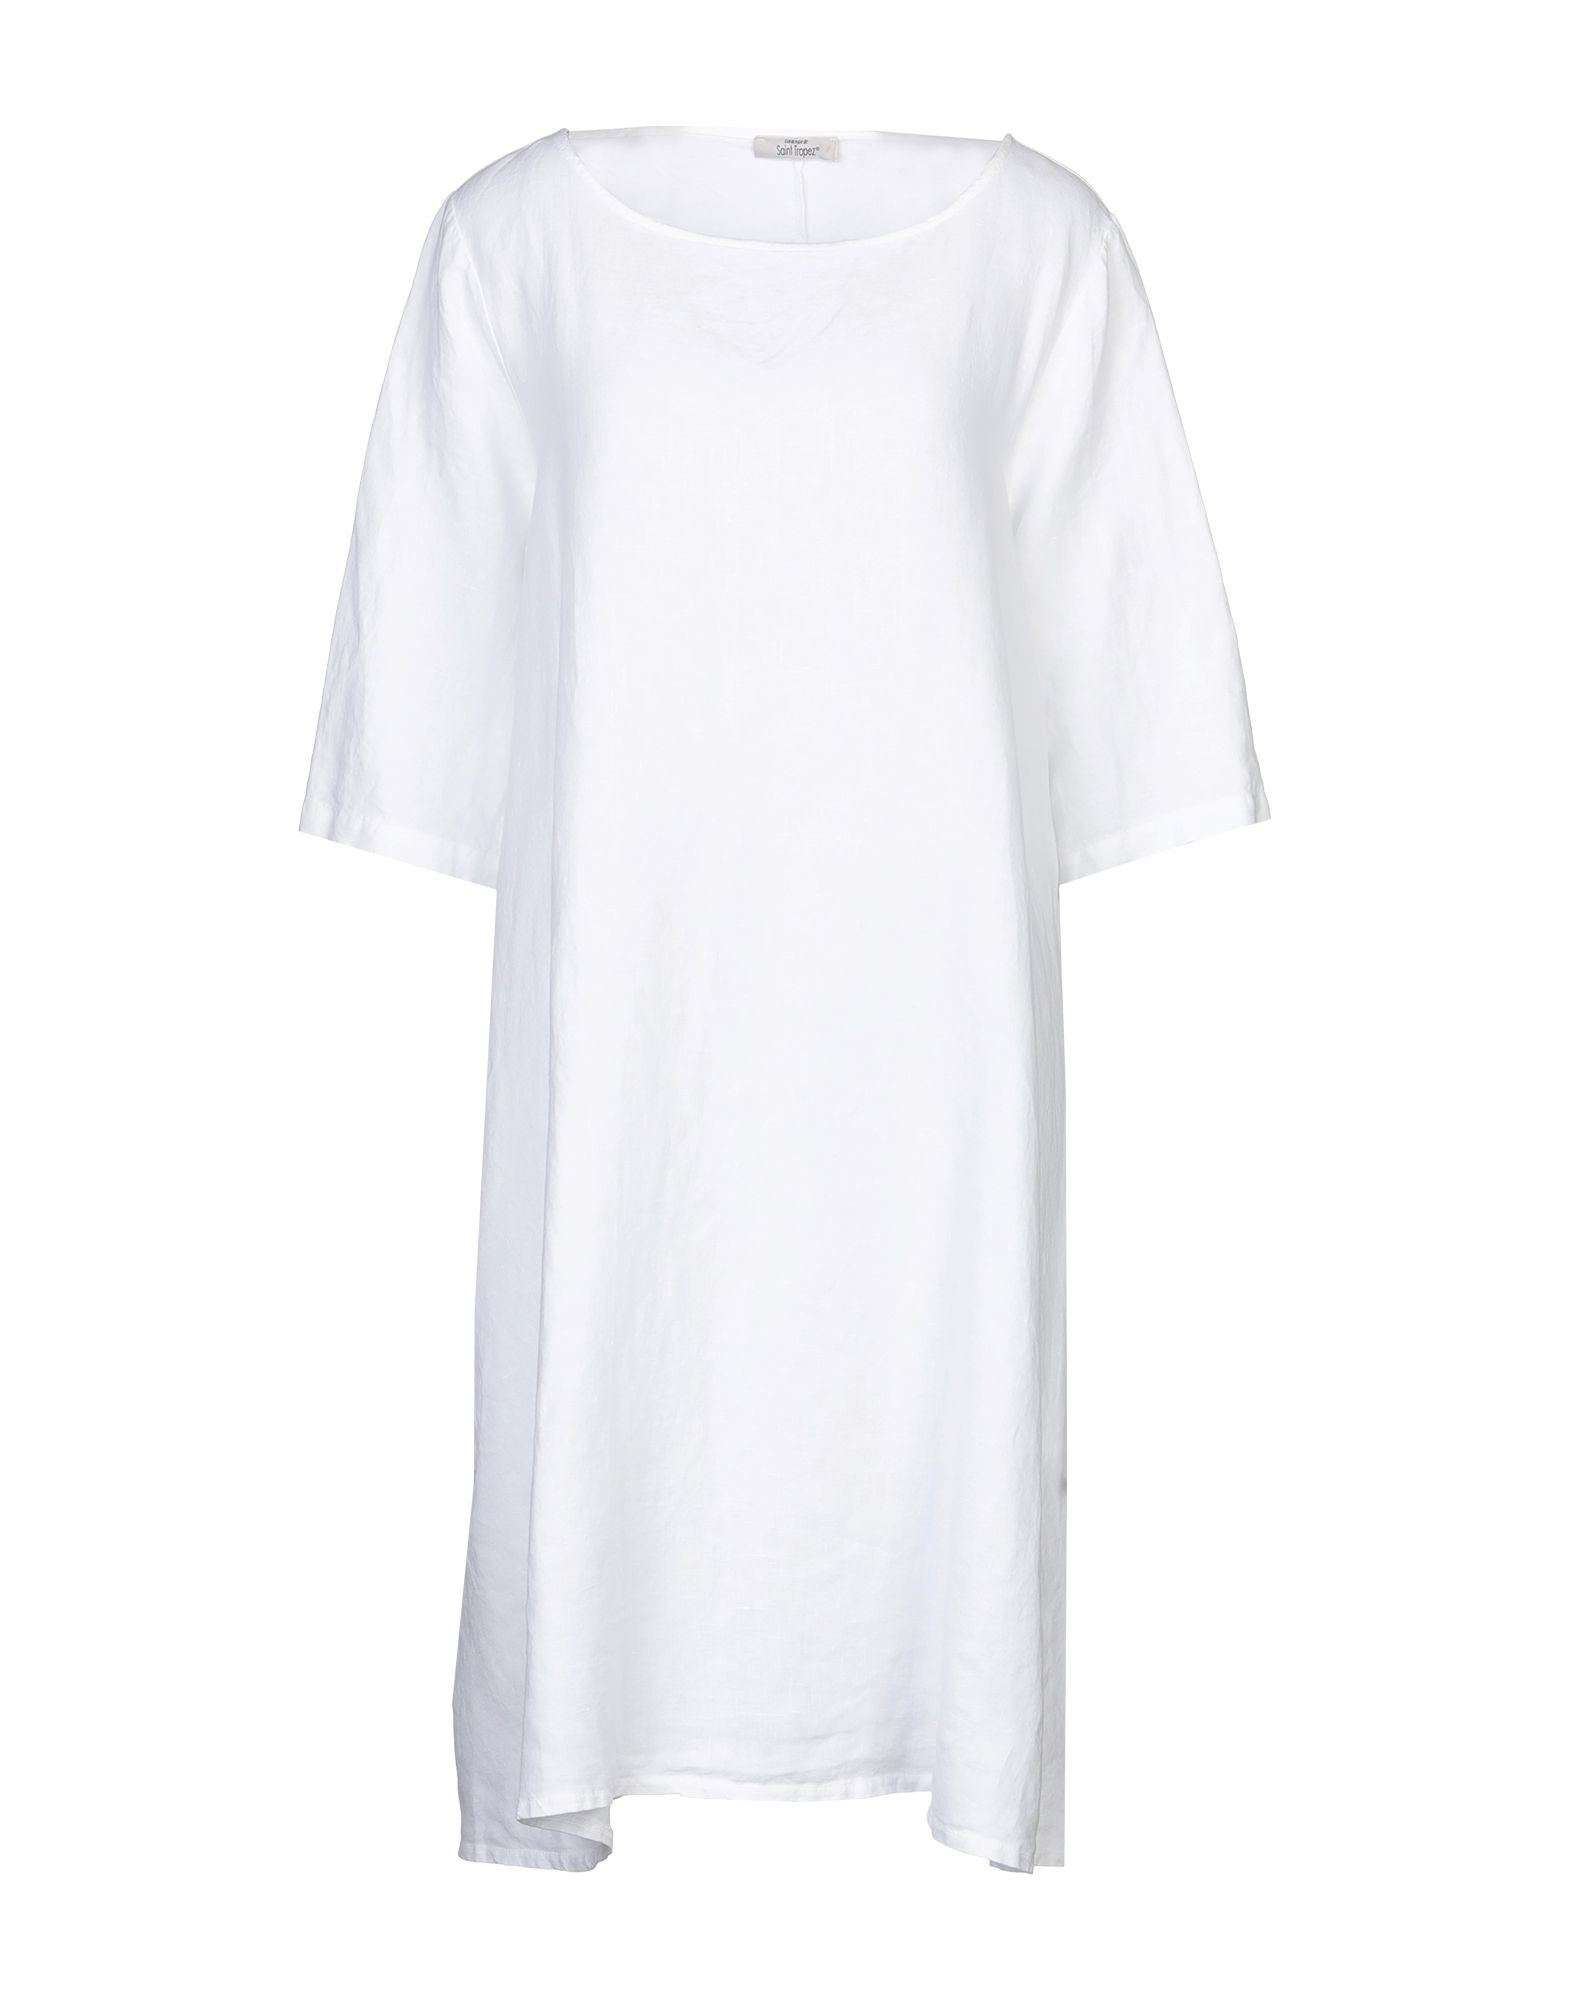 SAINT TROPEZ Короткое платье